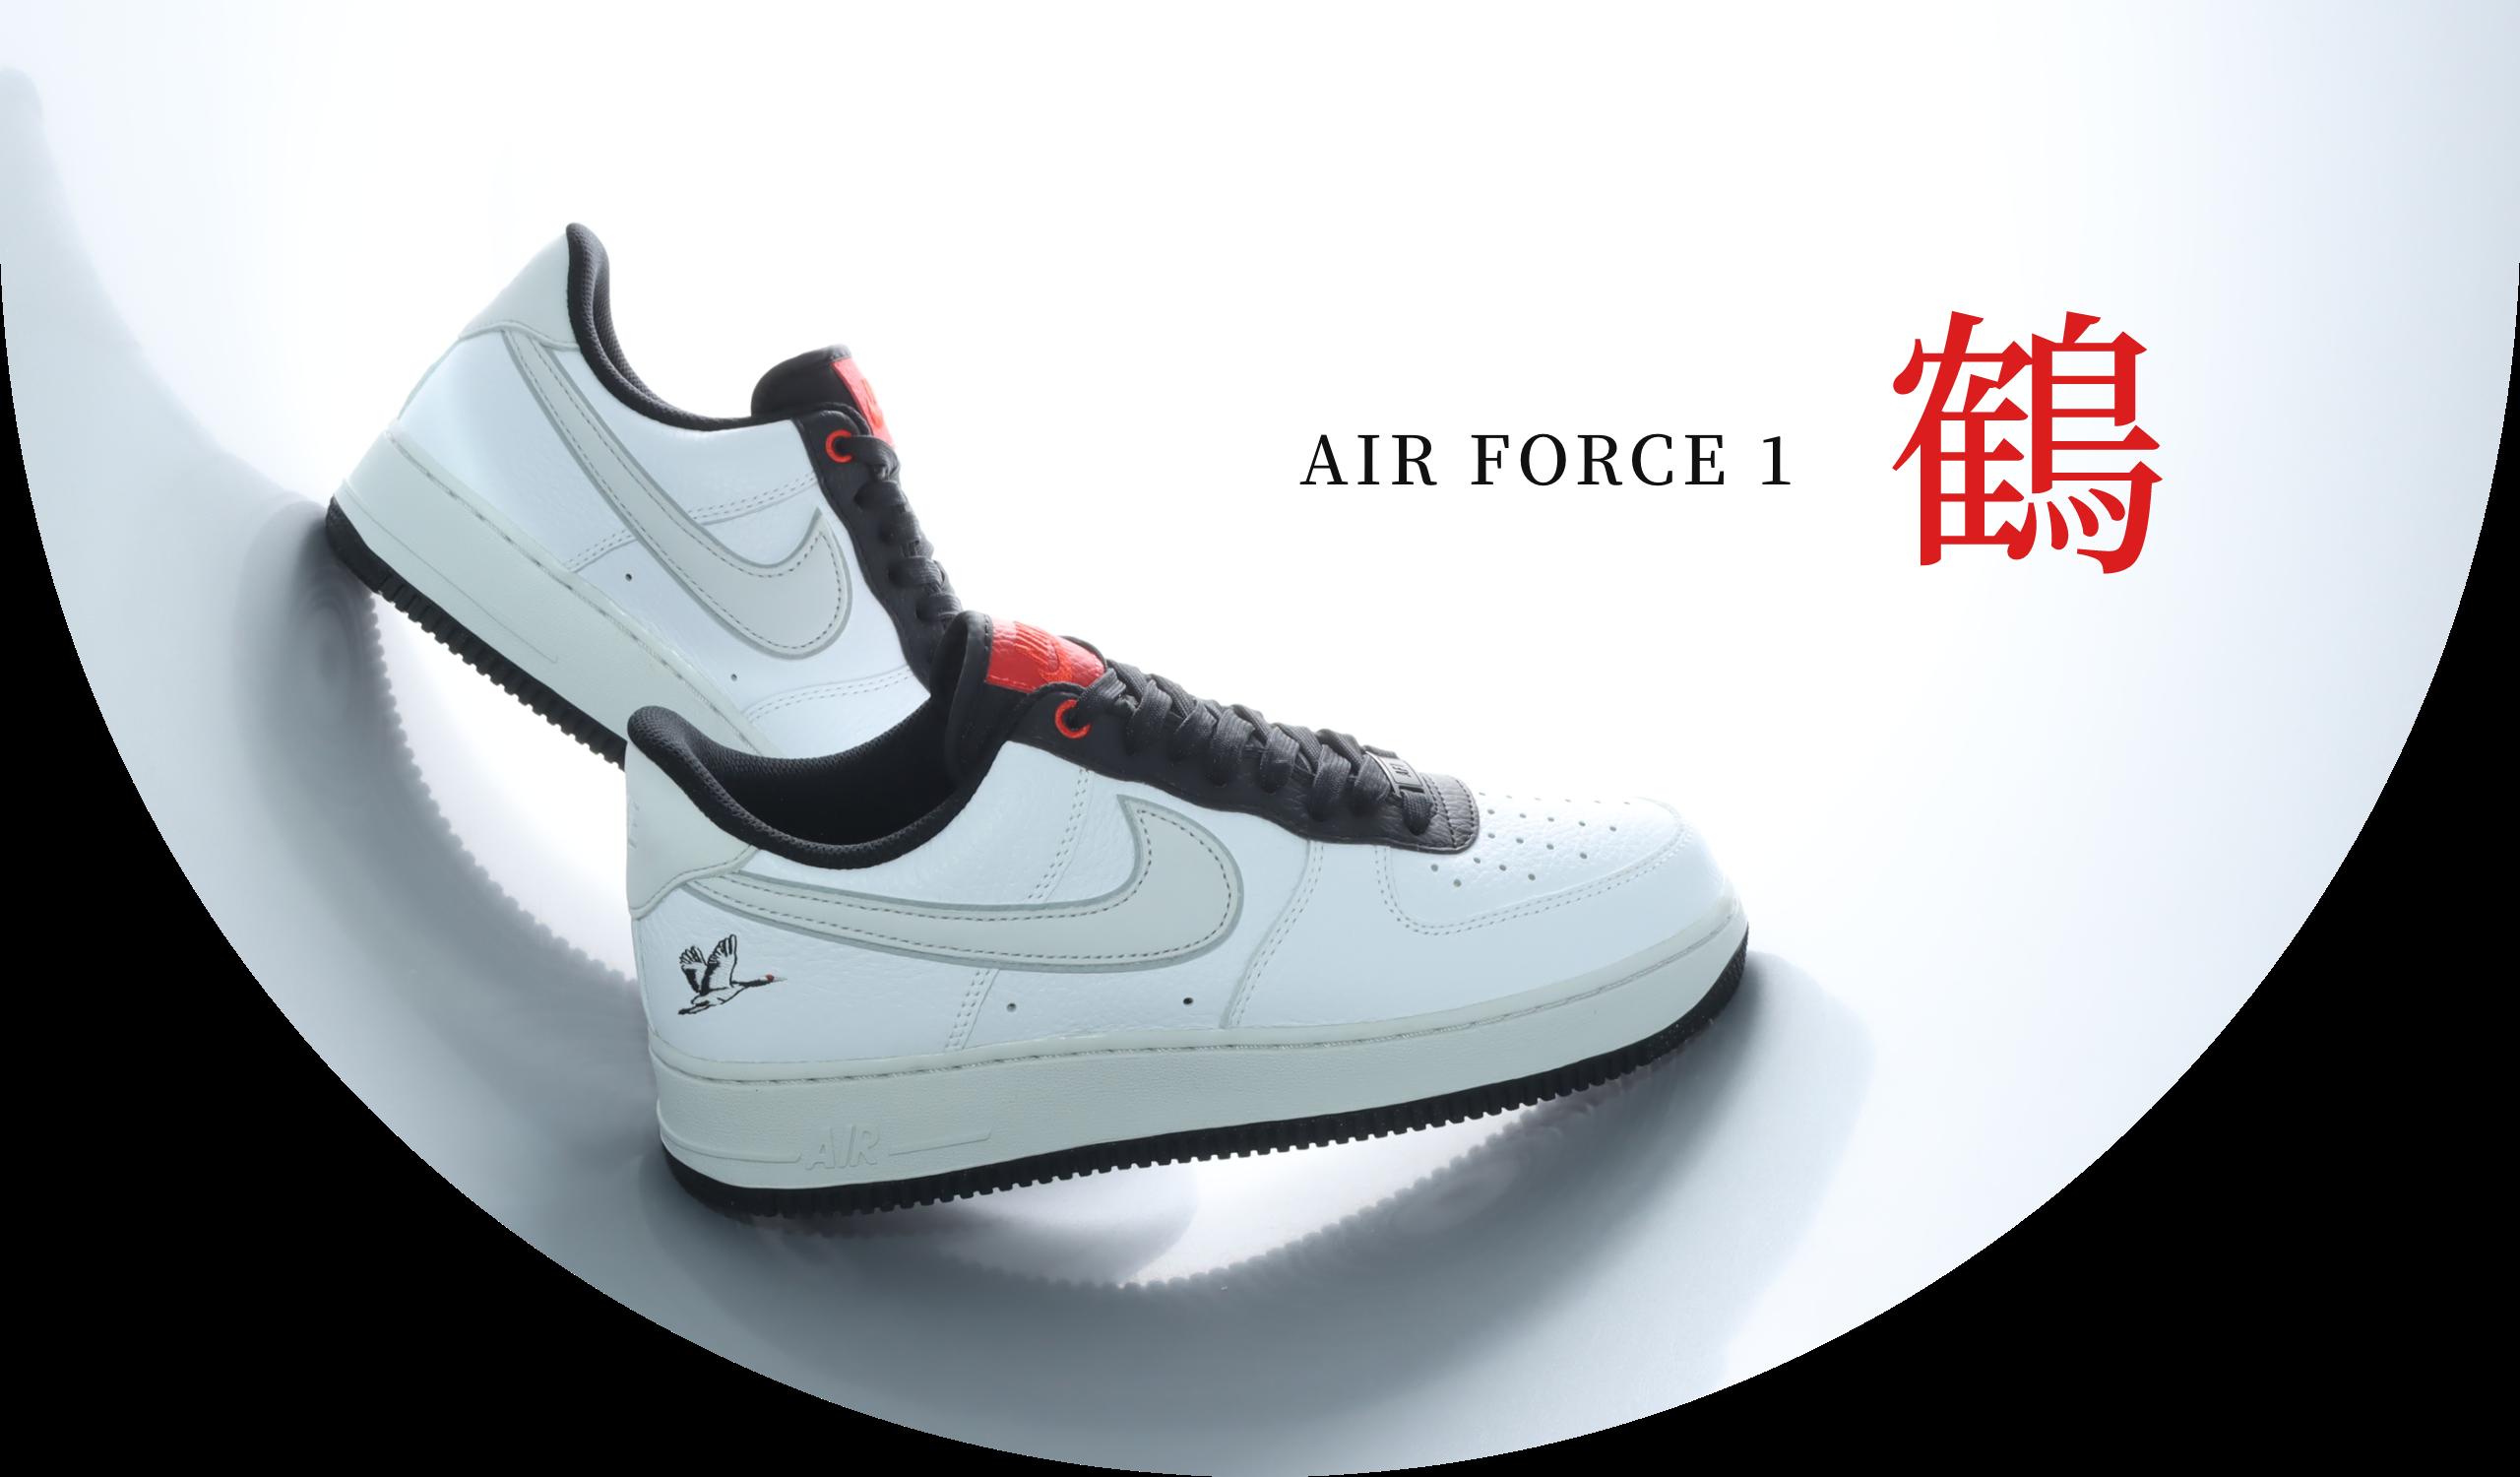 NIKE AIR FORCE 1 '07 LX 鶴亀PACK -鶴-